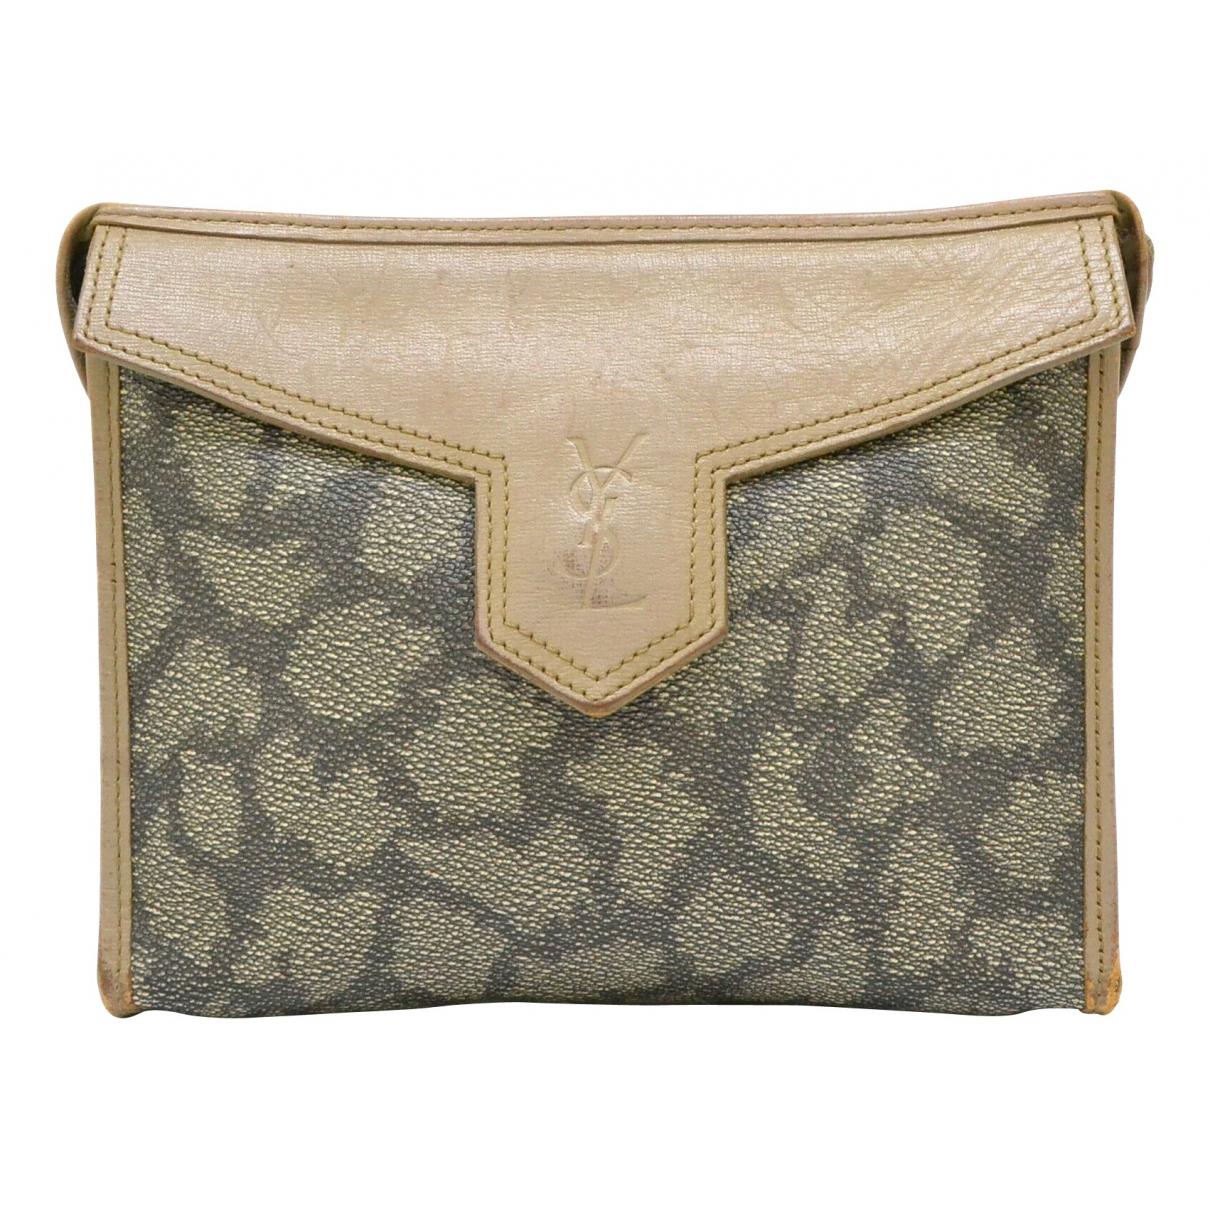 Yves Saint Laurent \N Khaki Cloth Clutch bag for Women \N